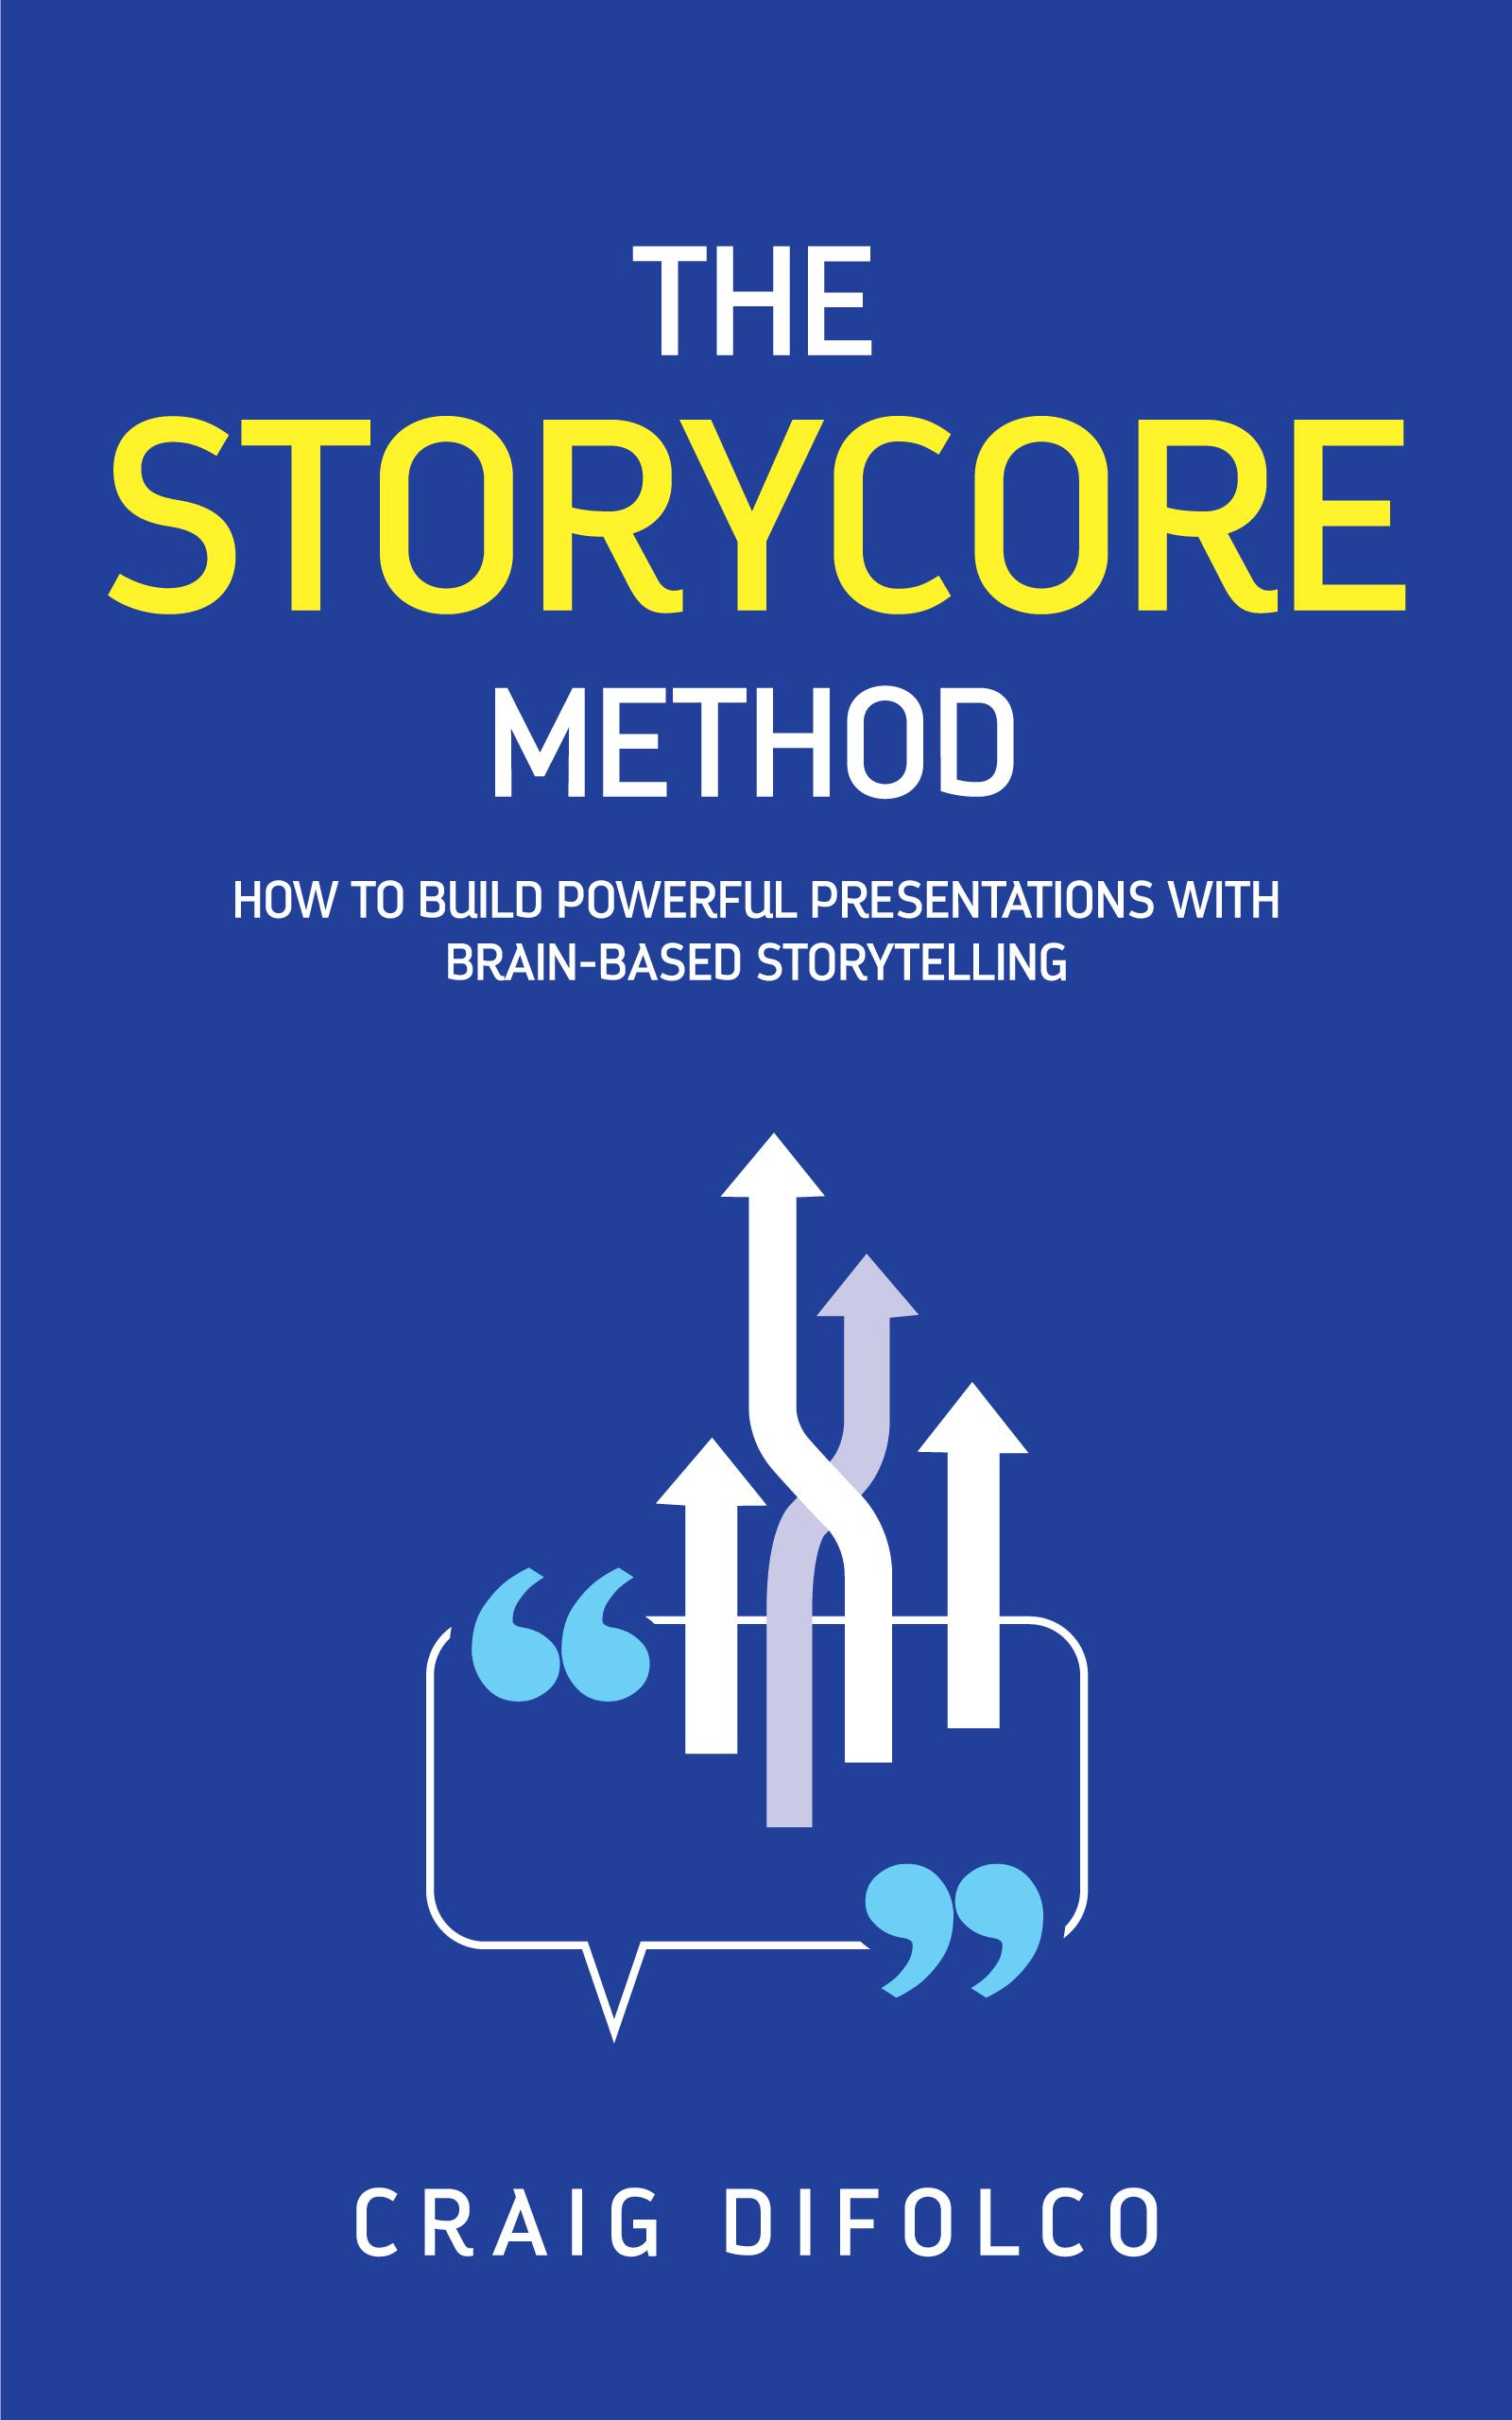 story-core-book(op).jpg